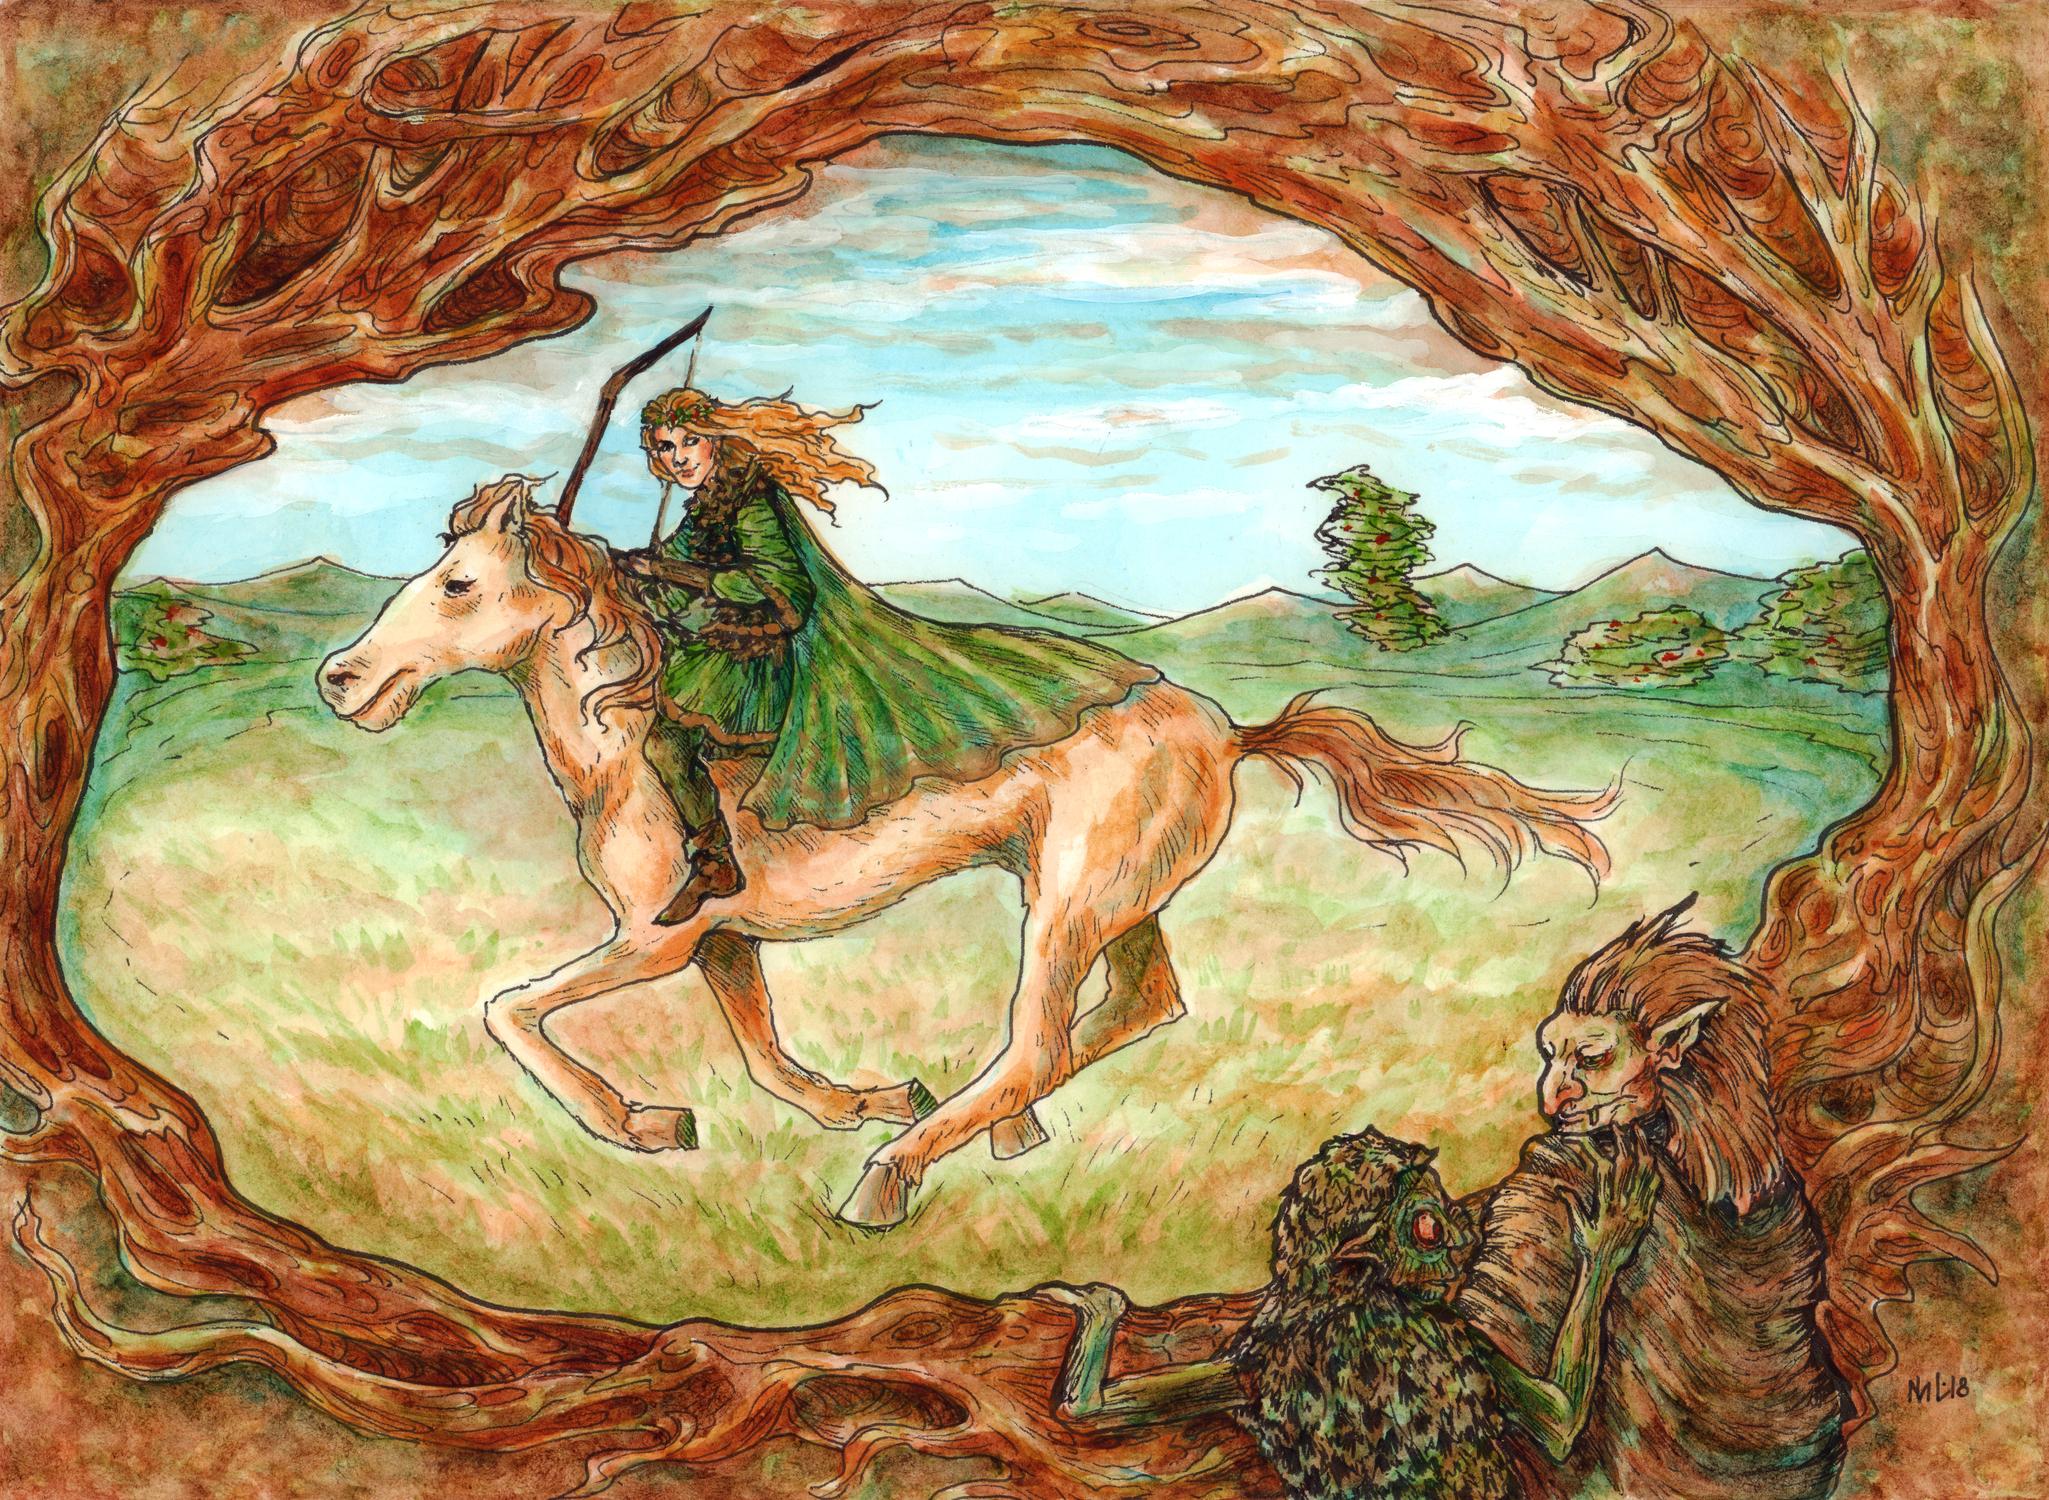 The Hunt Artwork by Morgan Lees